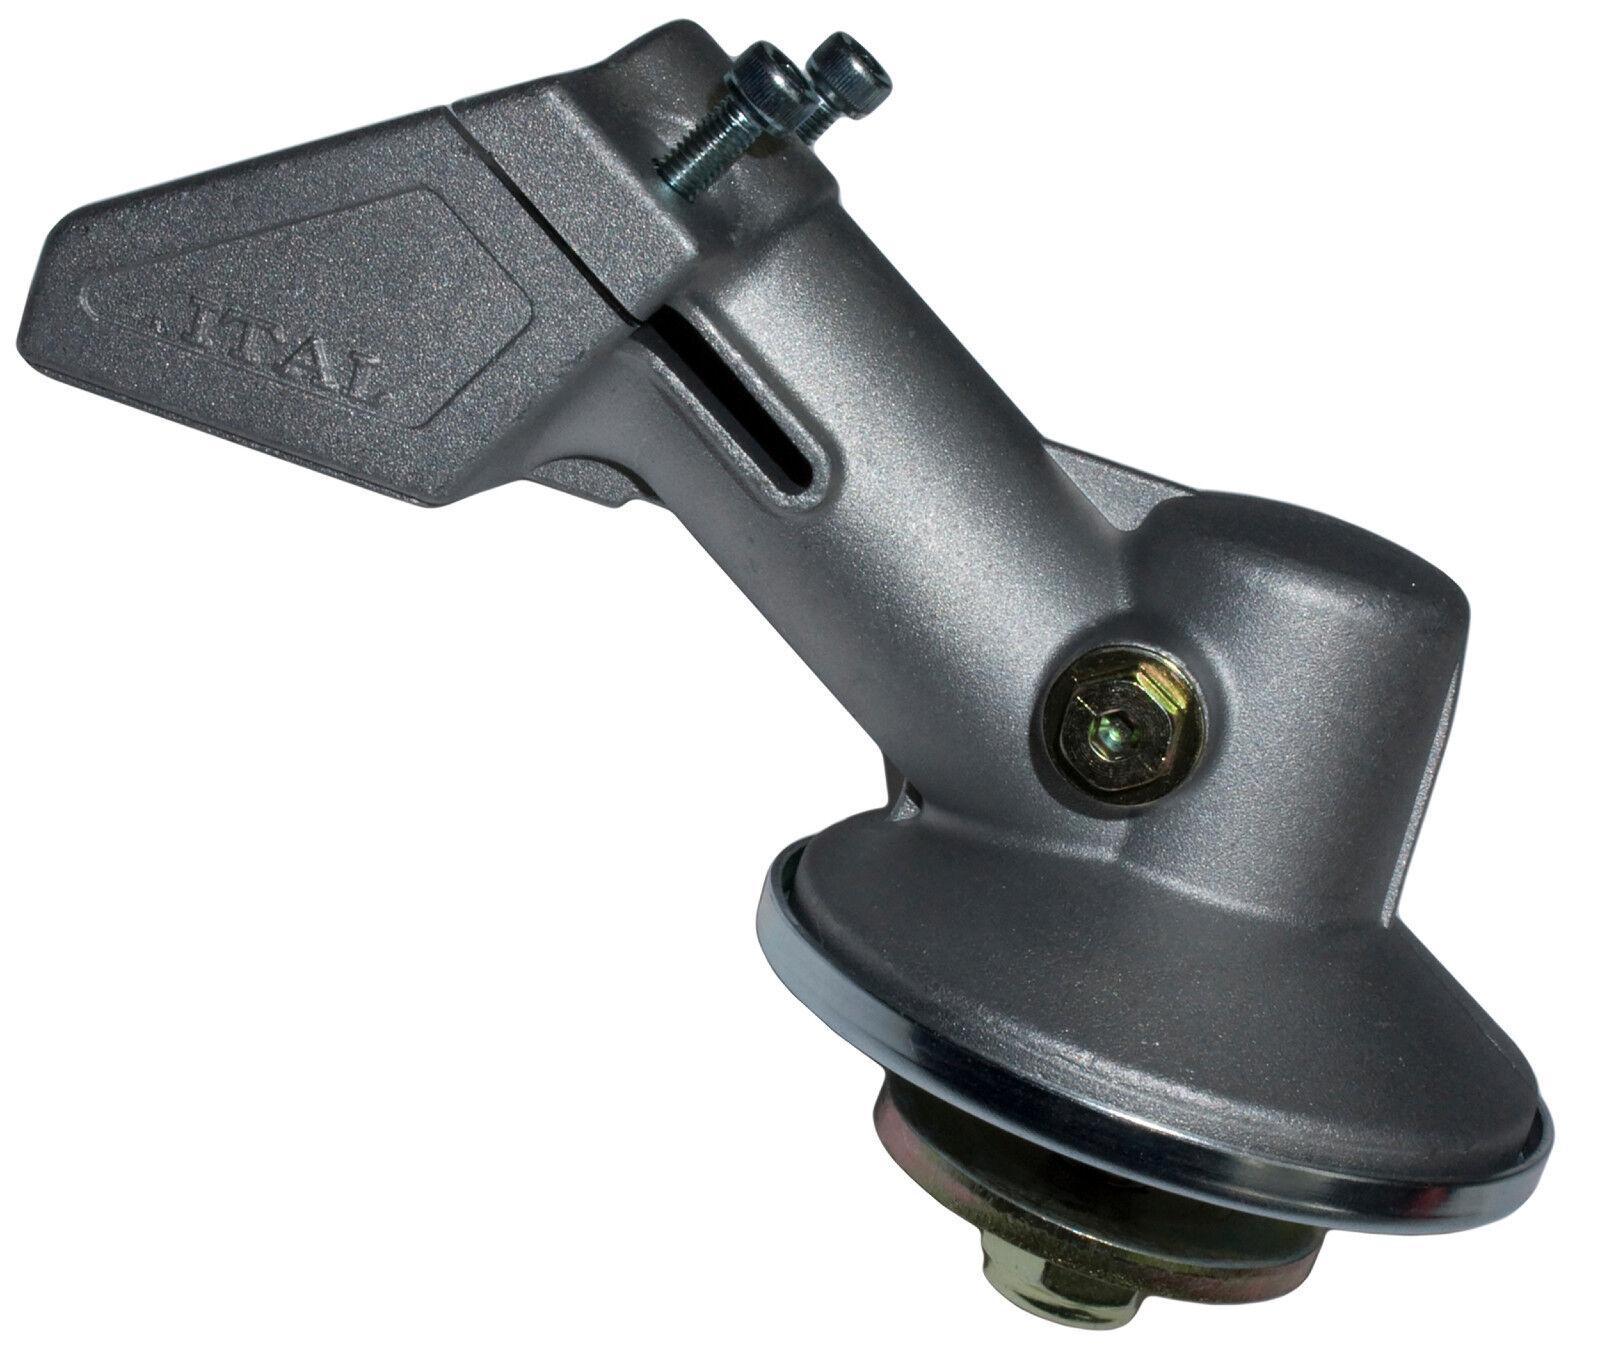 Caja de engranajes cabeza se Ajusta Stihl FS75 FS83 FS85 FS90 FS100 FS120 FS130 FS200 FS250